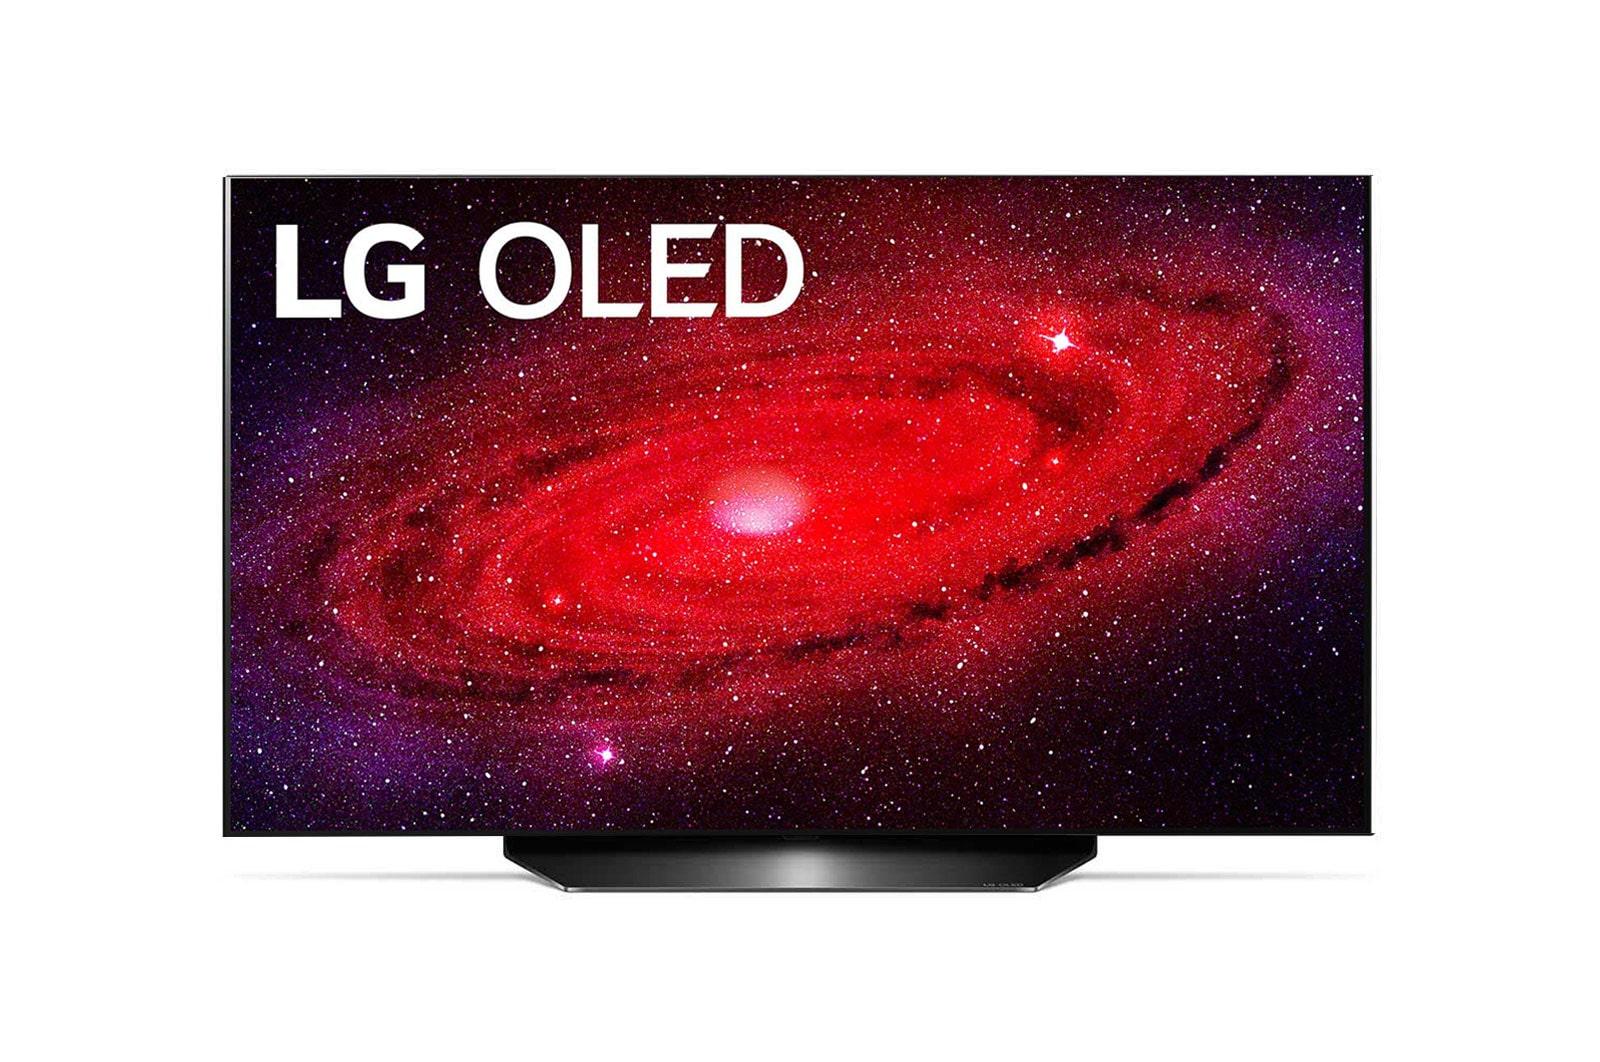 LG 様々なお部屋で4K有機EL画質が楽しめる豊富なサイズラインアップ。, OLED48CXPJA